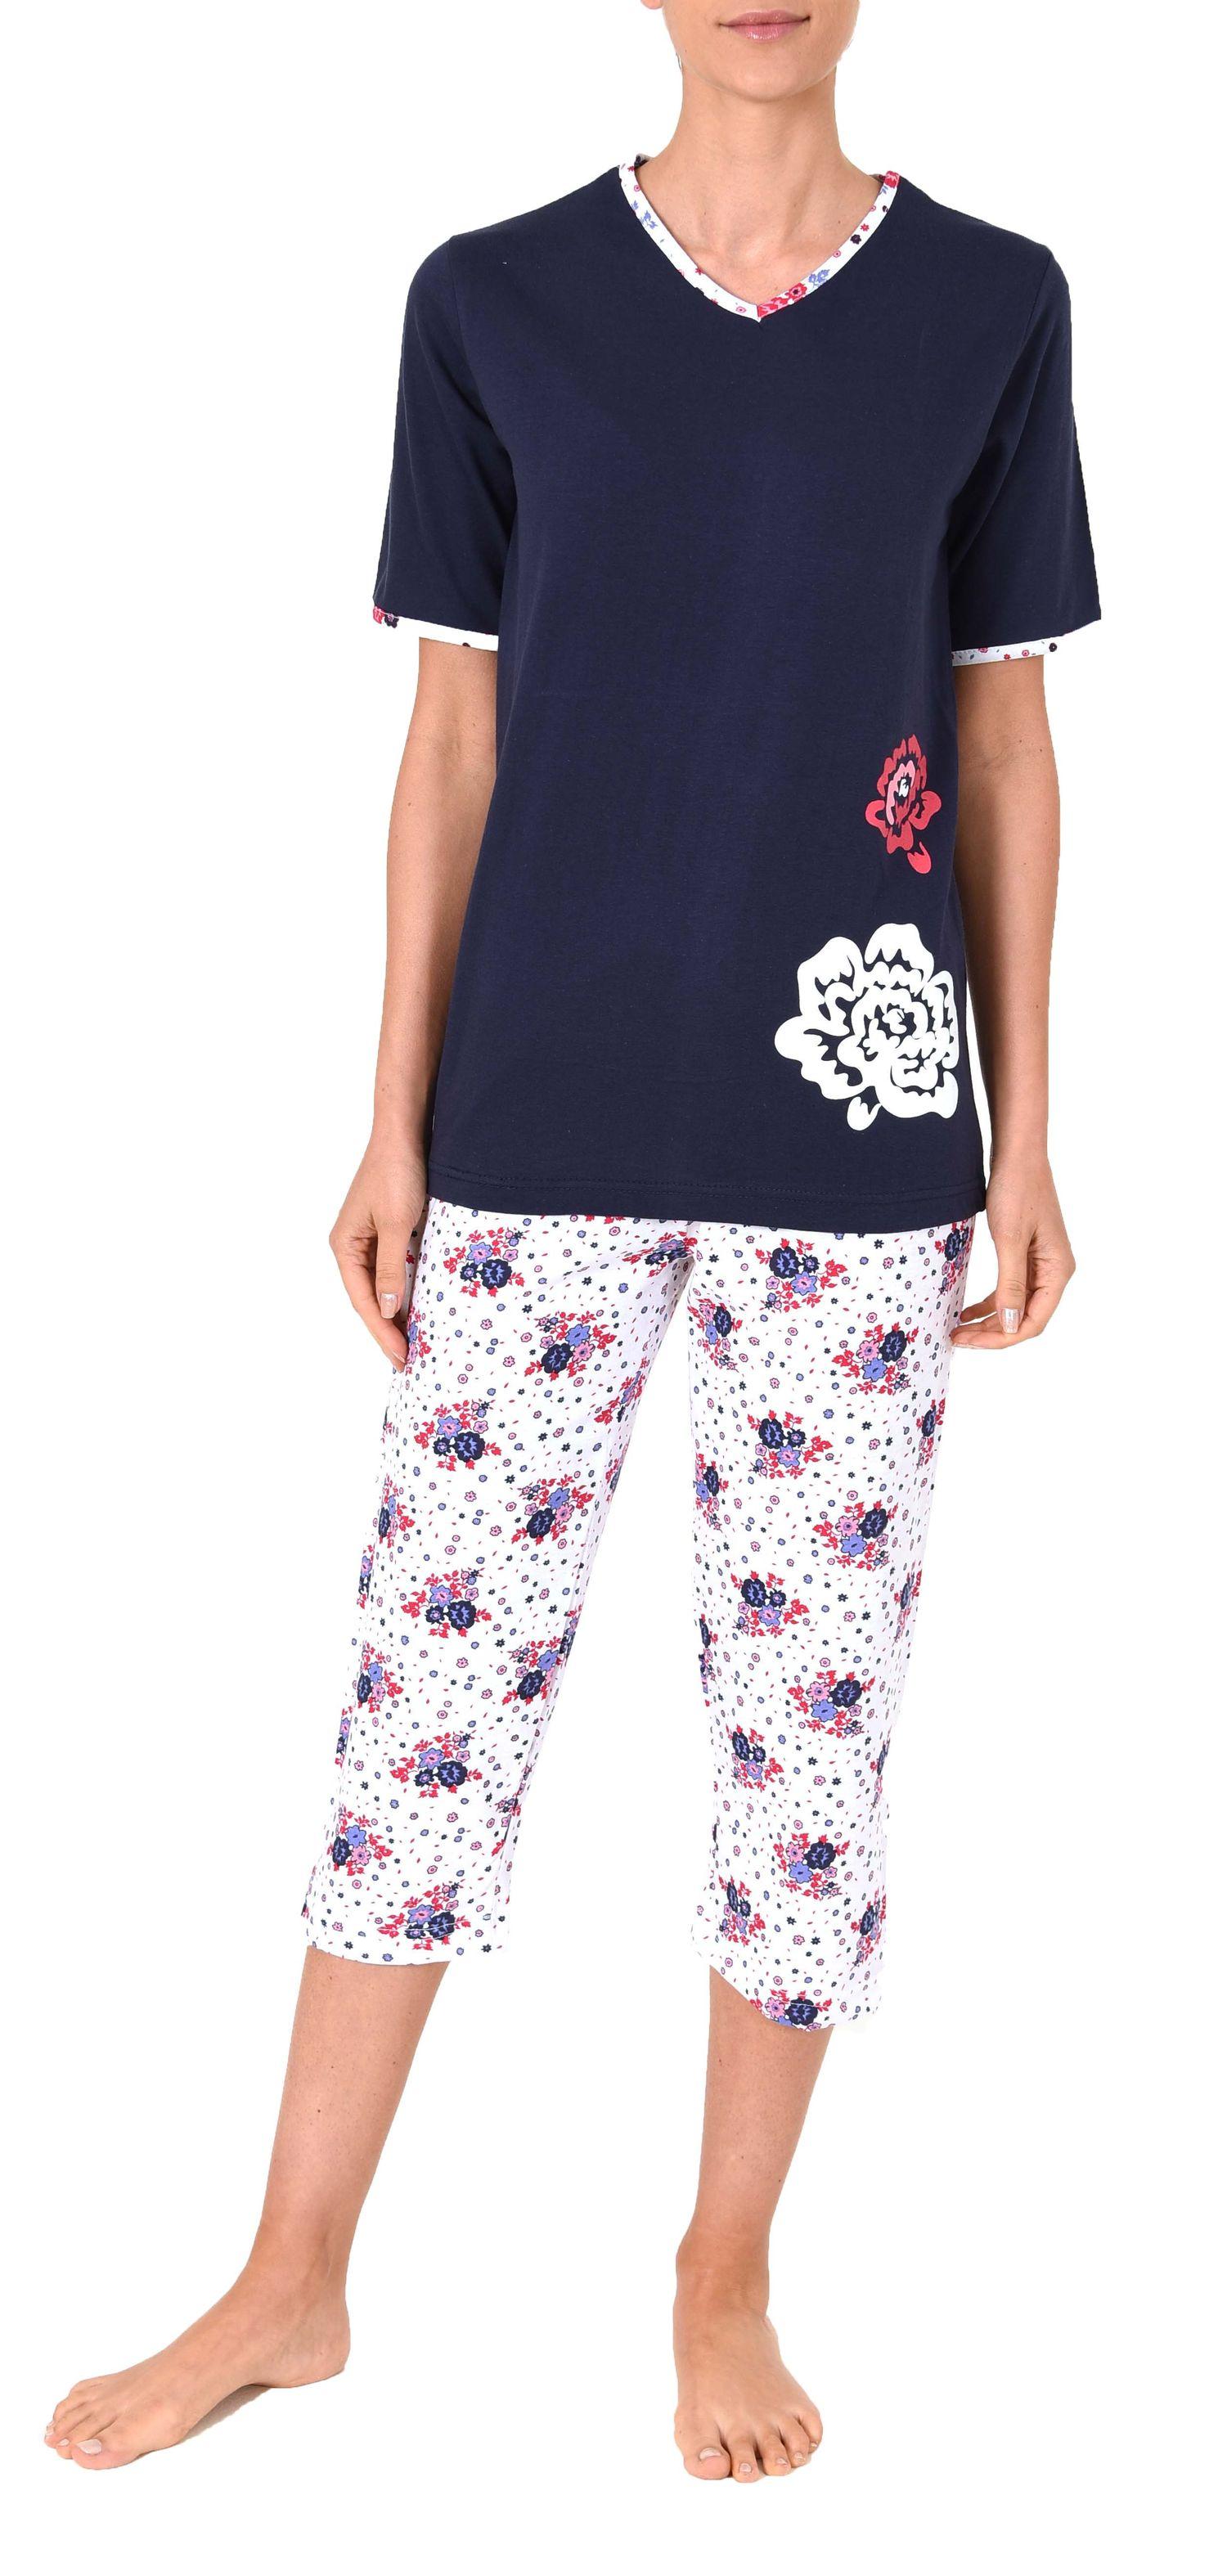 Damen Capri Pyjama kurzarm Schlafanzug mit 3/4-langer Hose, Blume als Motivprint – 60848 – Bild 2